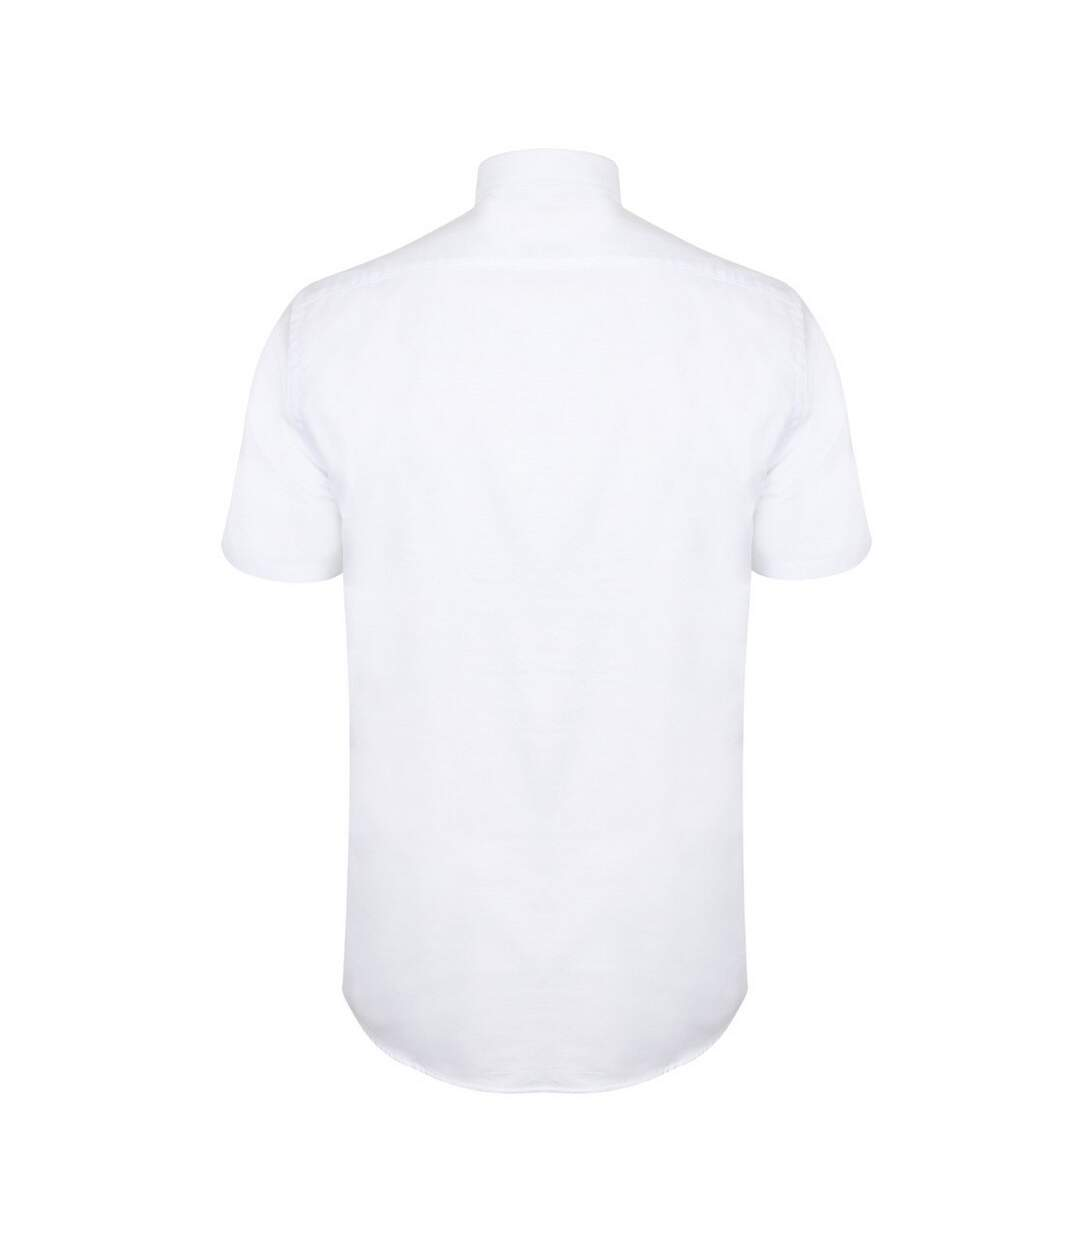 Henbury Mens Modern Short Sleeve Oxford Shirt (White) - UTRW5425